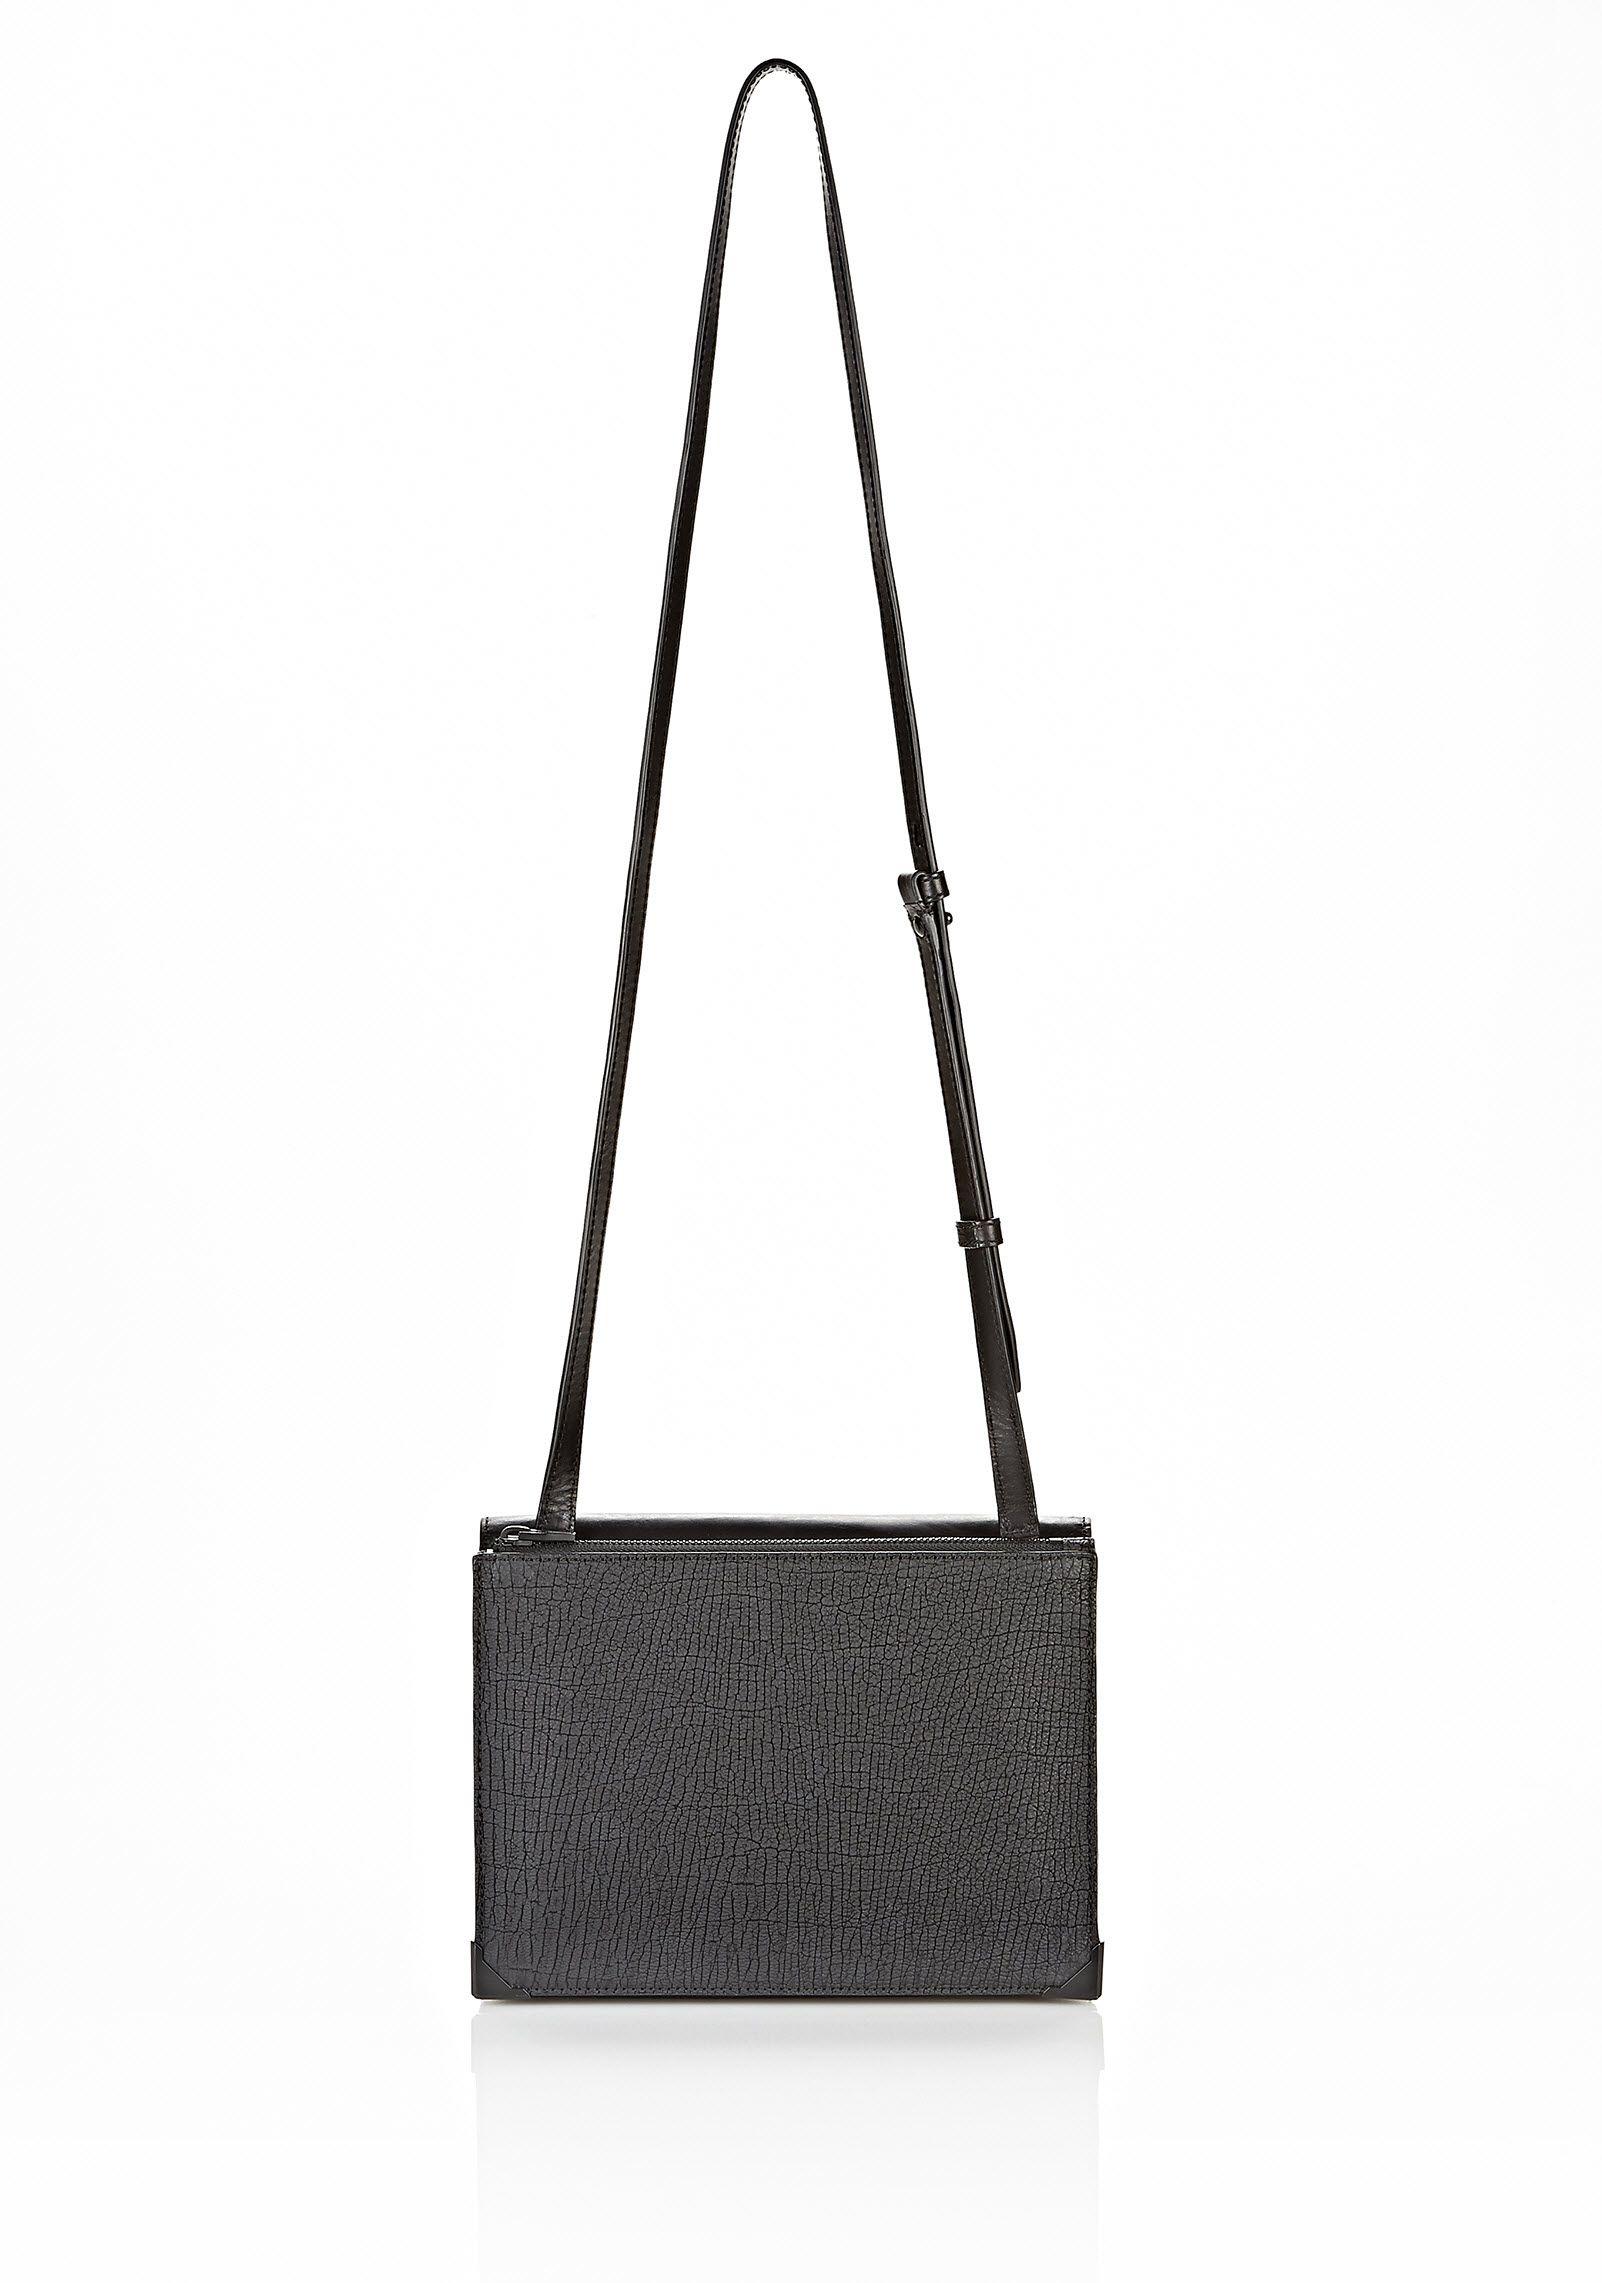 PRISMA SKELETAL DOUBLE ENVELOPE CLUTCH IN EMBOSSED BLACK WITH MATTE BLACK - Shoulder Bags Women - Alexander Wang Online Store